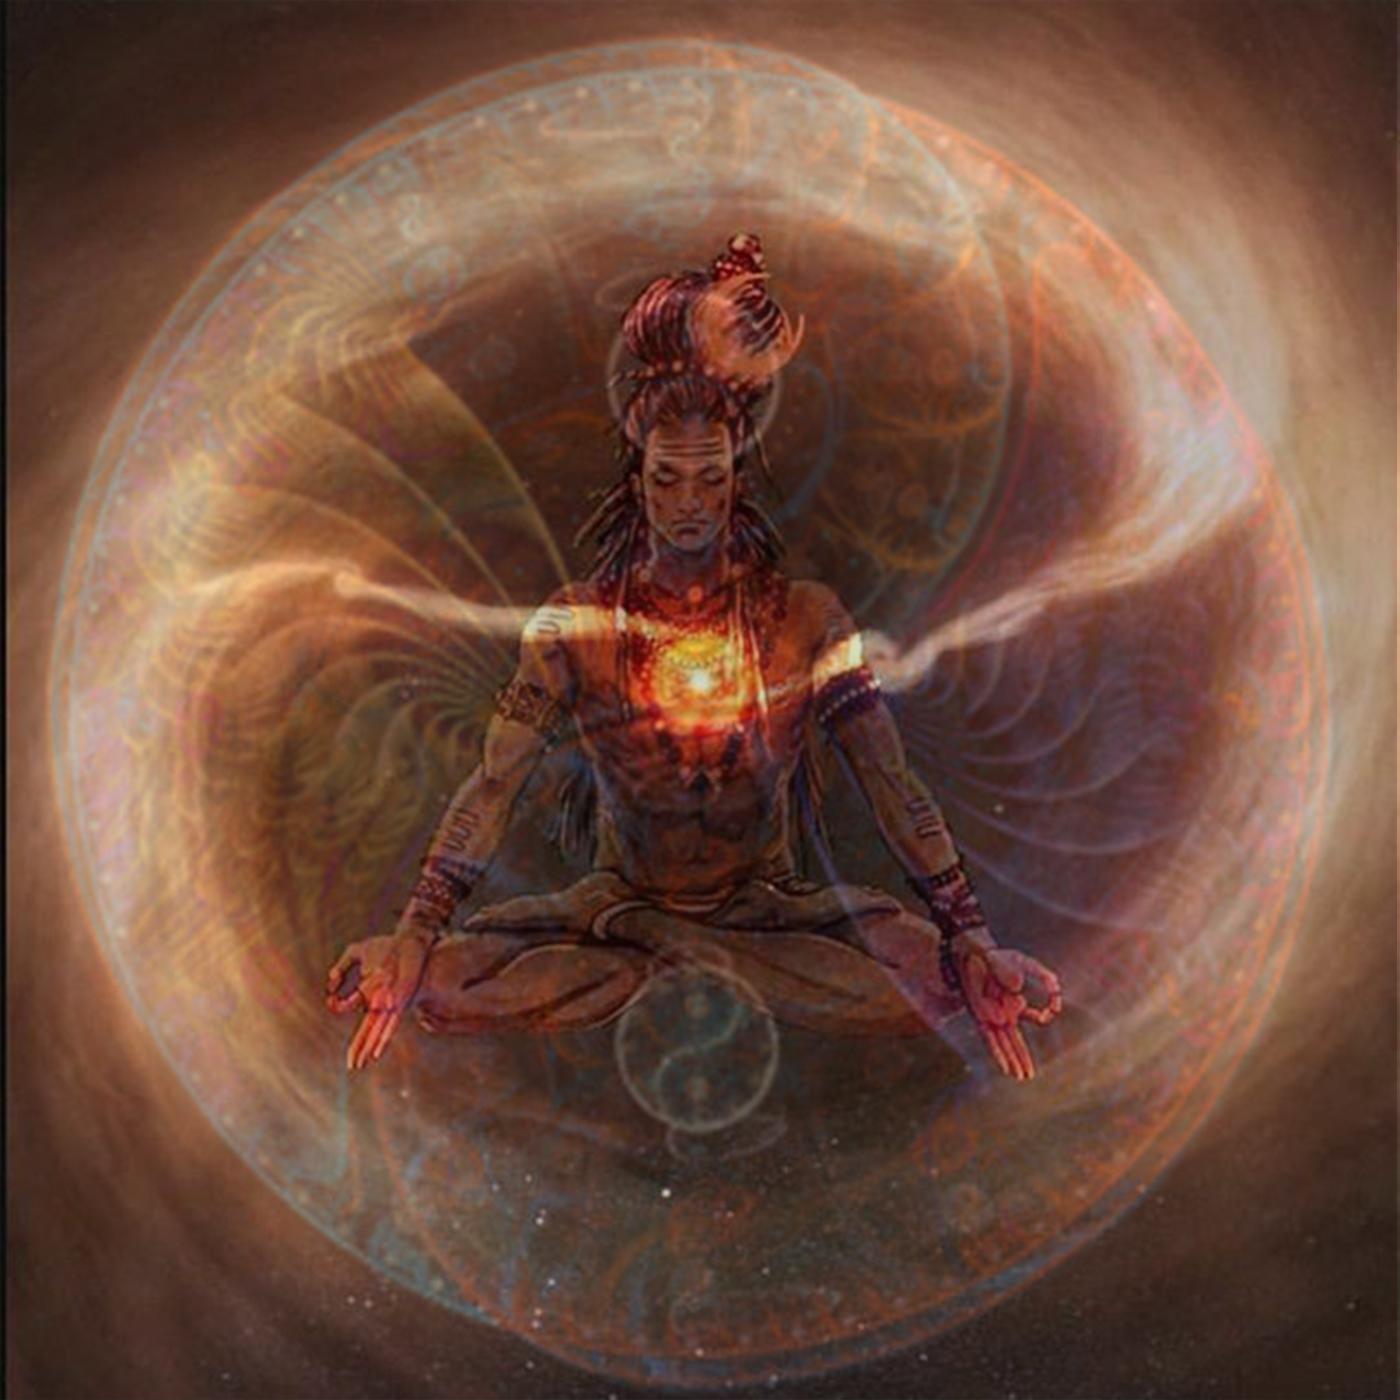 anger, body healing, breakingoldpattrens, chakra, emotionalpattrens, emotions, fullfilledlife, happiness, hate, healing, hurt, jealousy, love, pain, selflove, subconscious